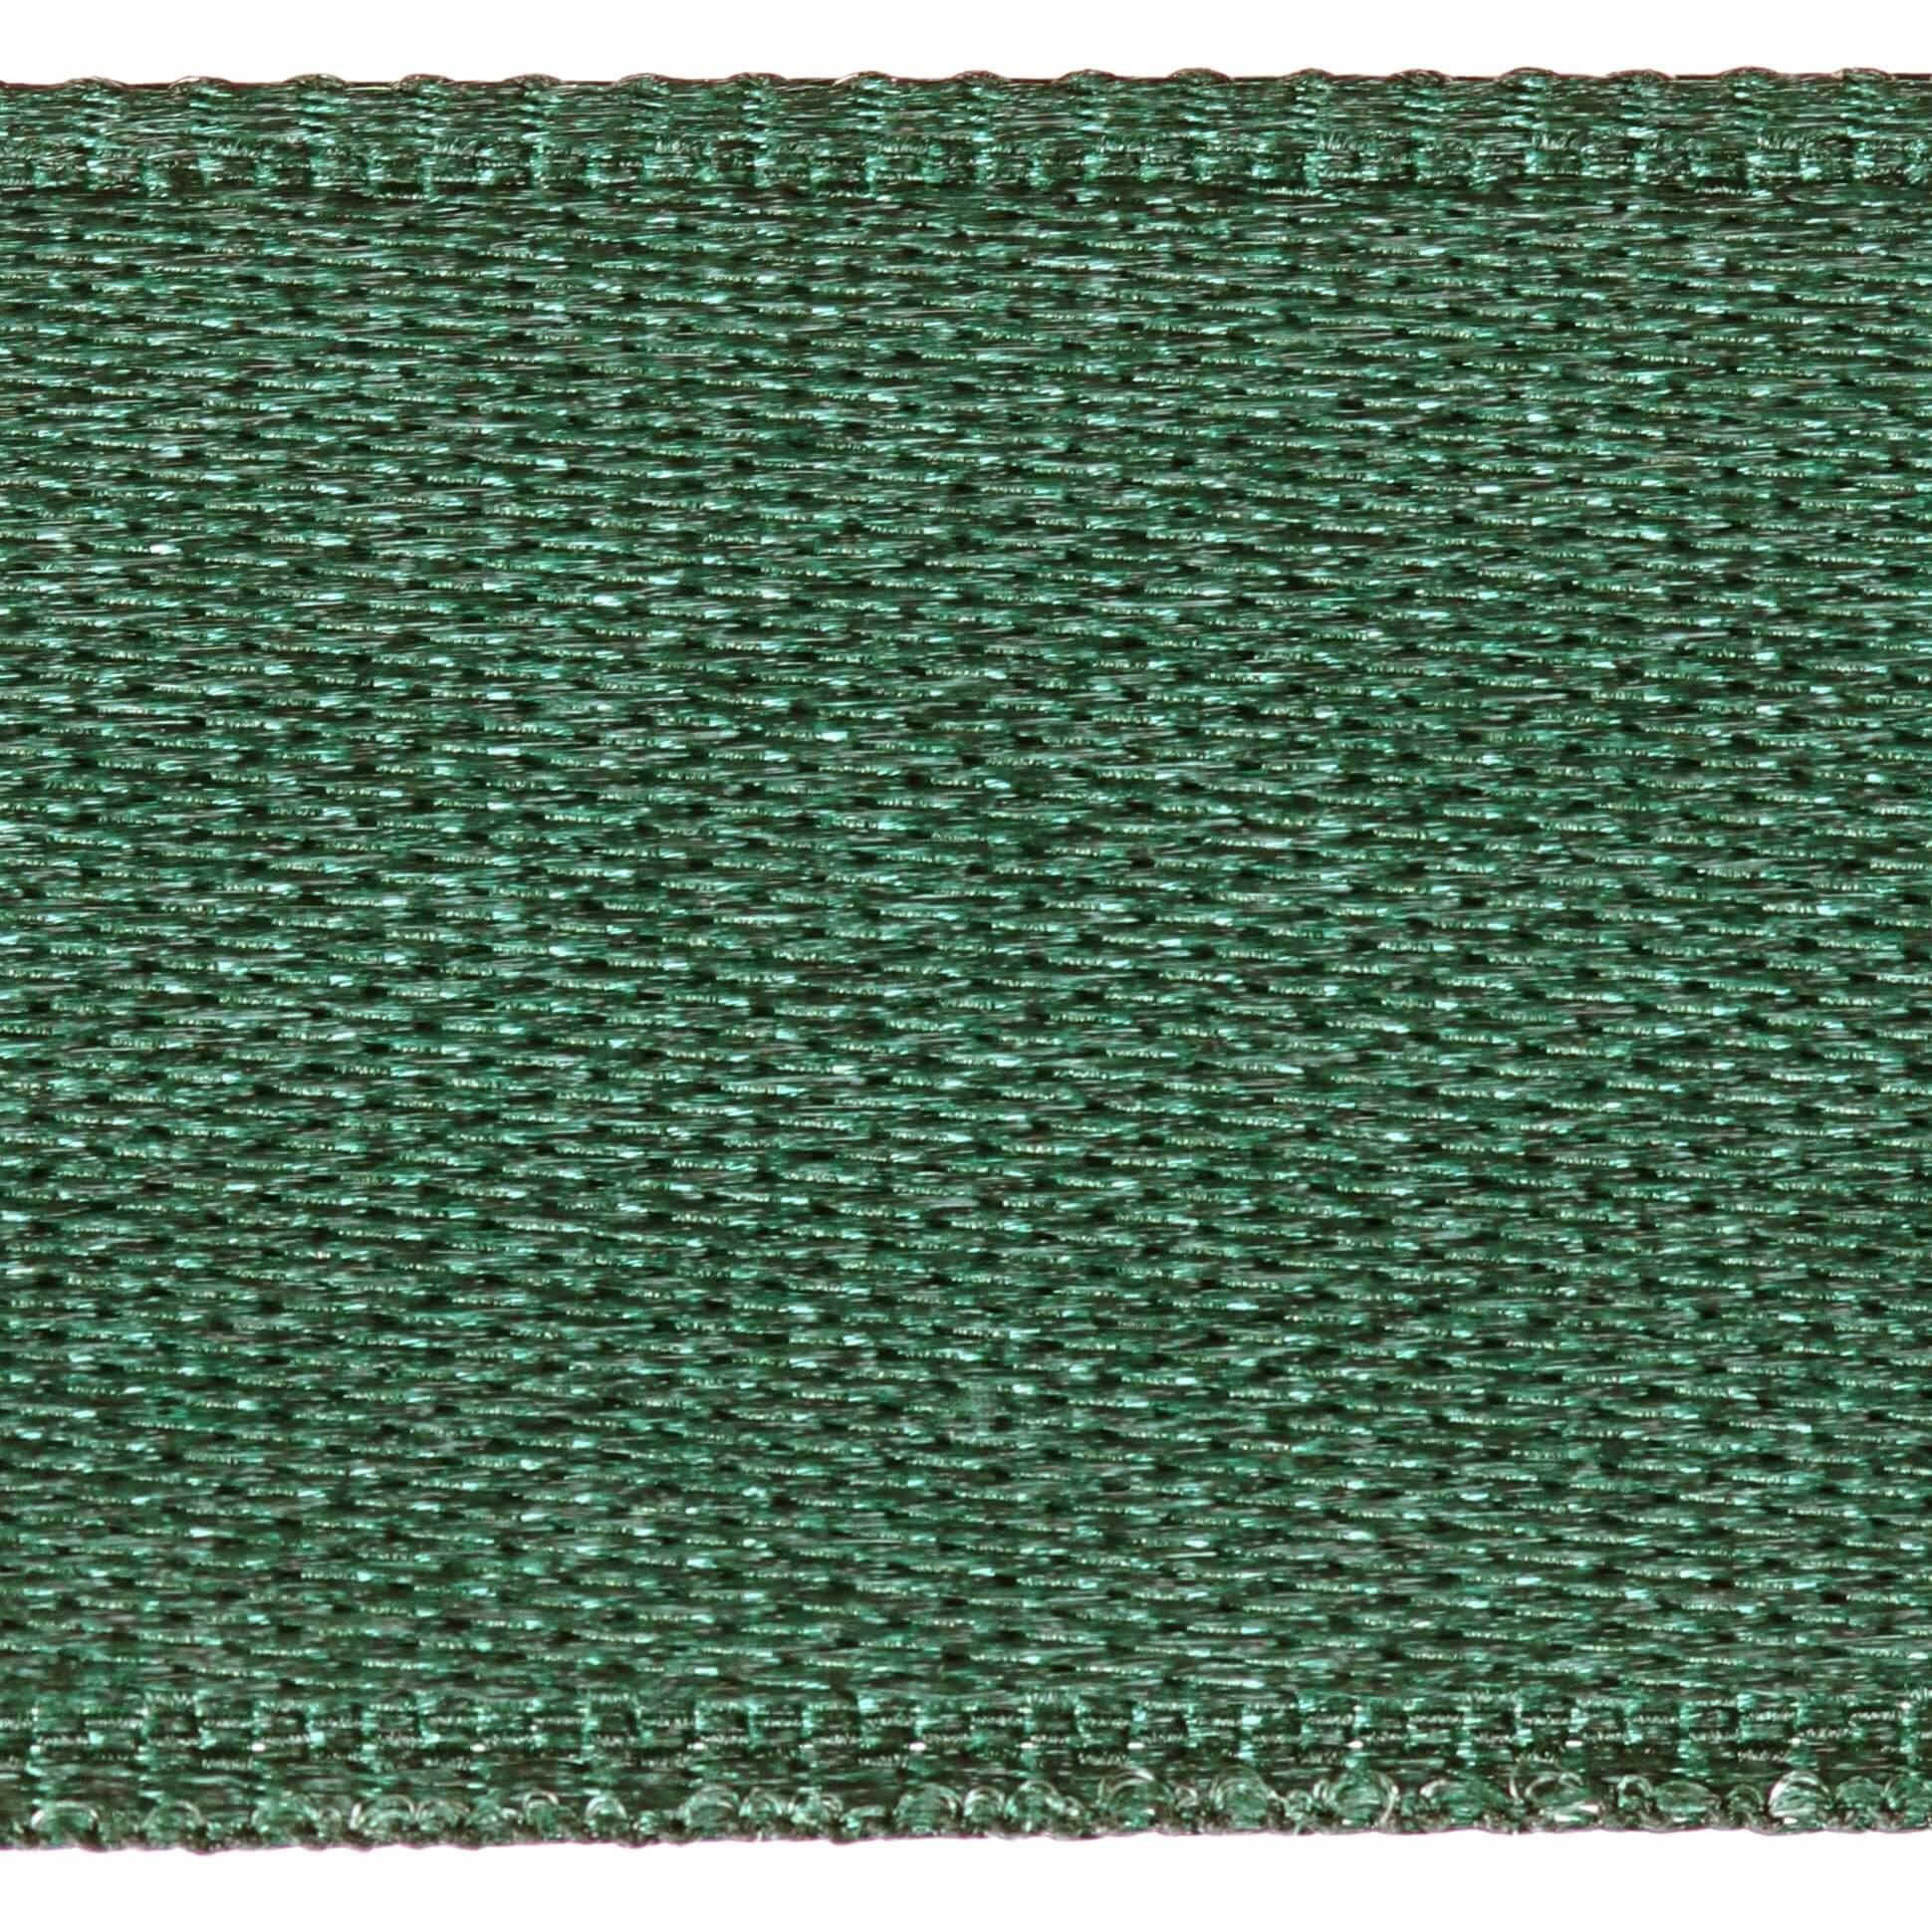 Forest Green Col. 534 - 15mm Satab Satin Ribbon